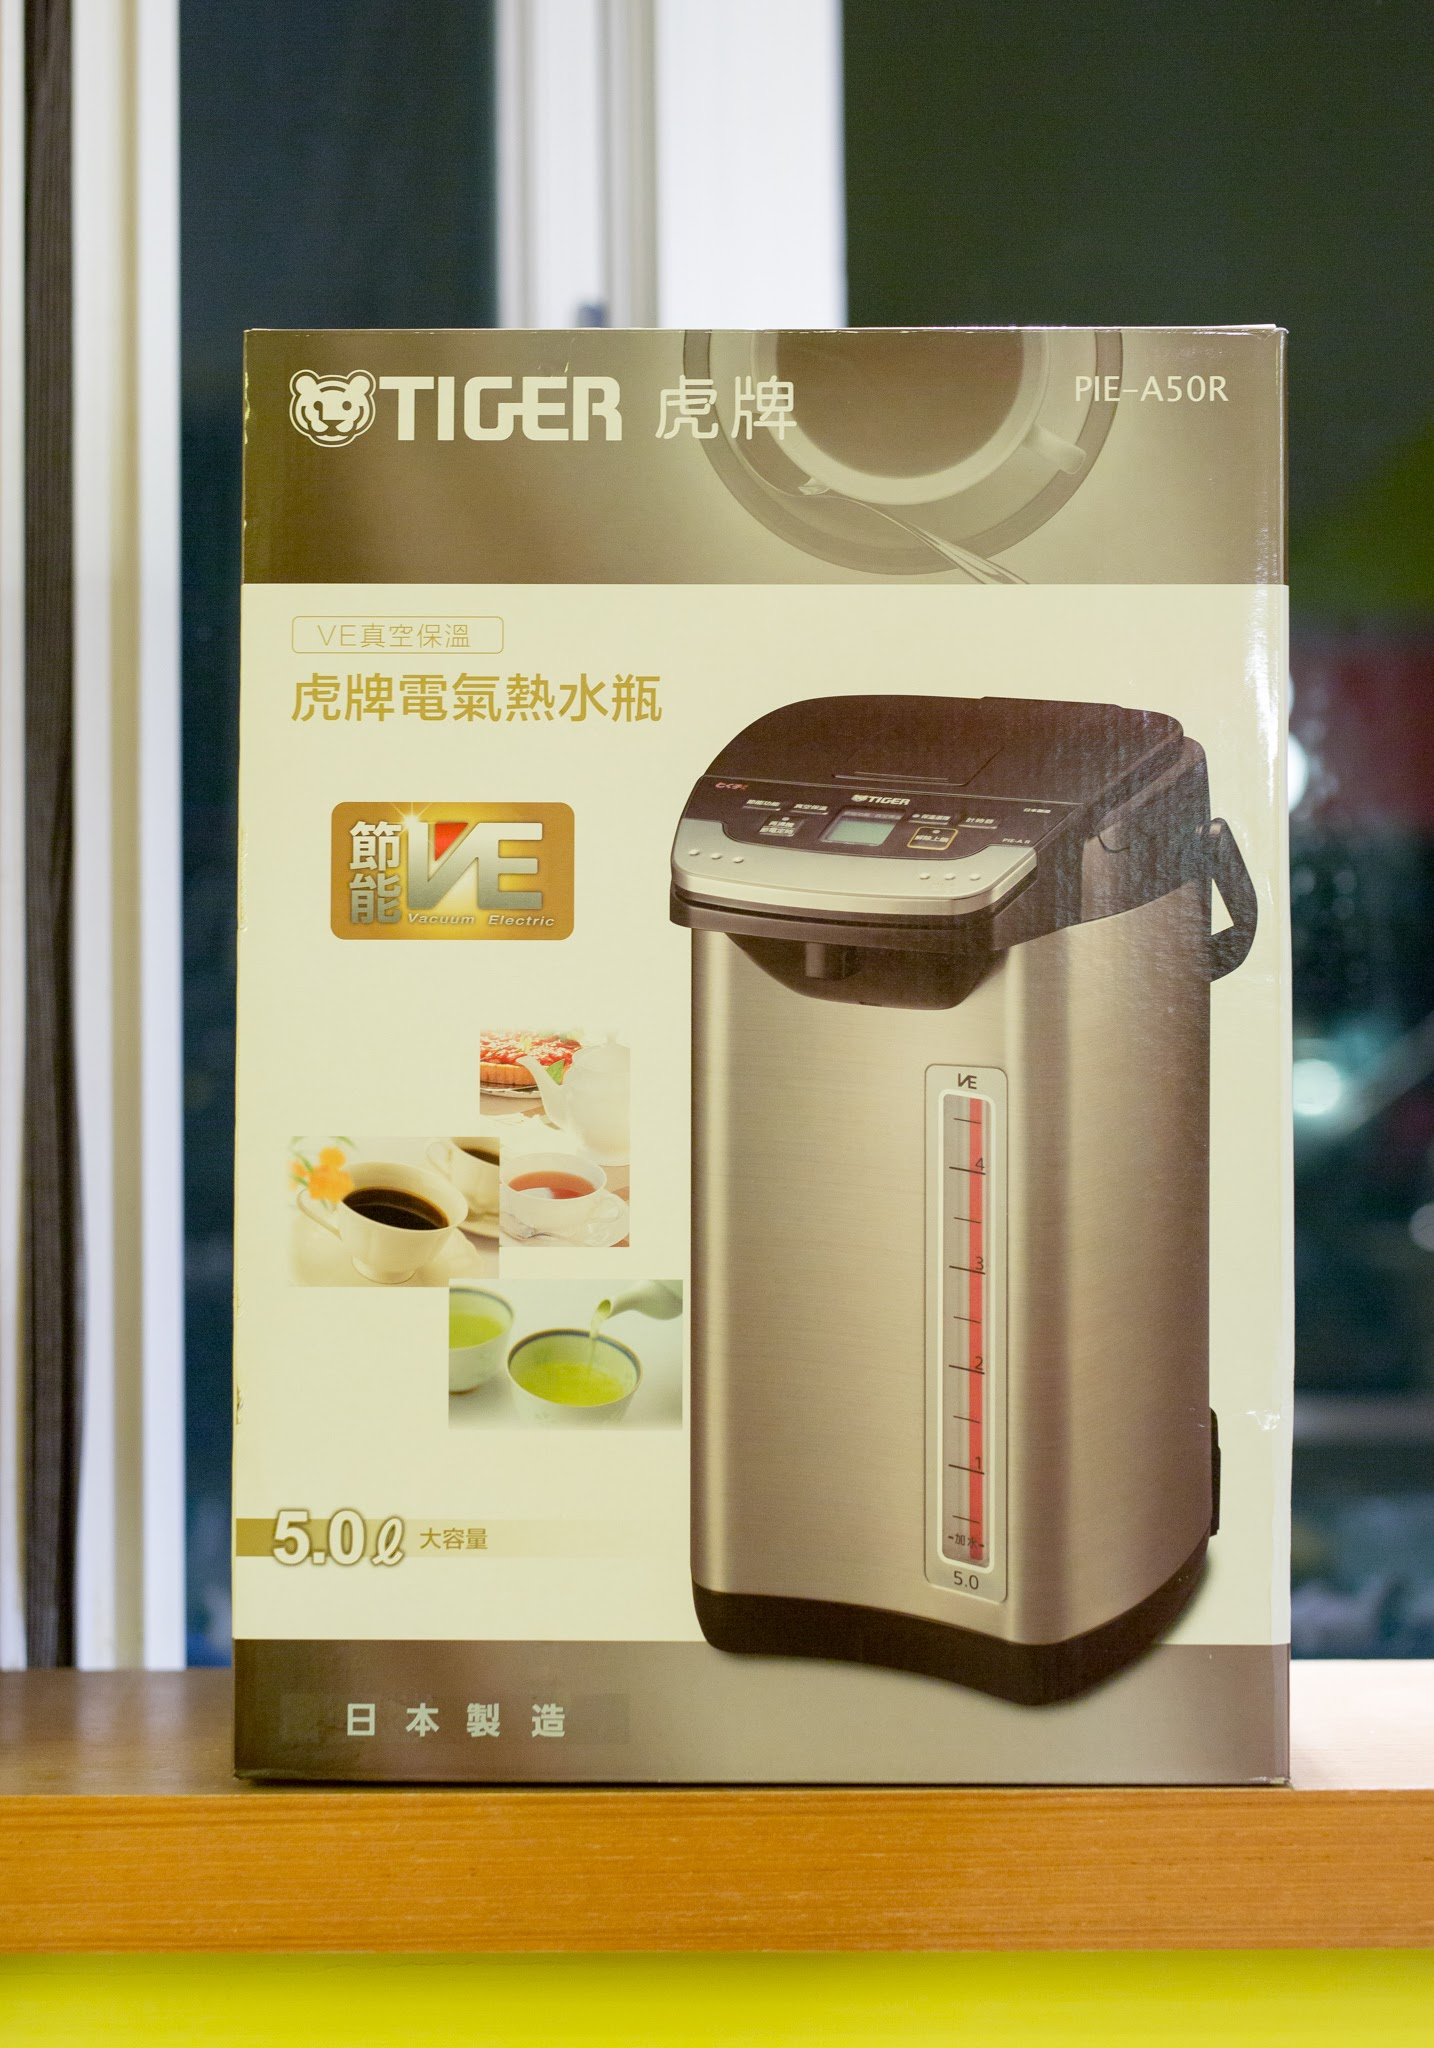 TIGER虎牌VE節能省電真空熱水瓶,TIGER虎牌VE節能省電真空熱水瓶PIE-A50R